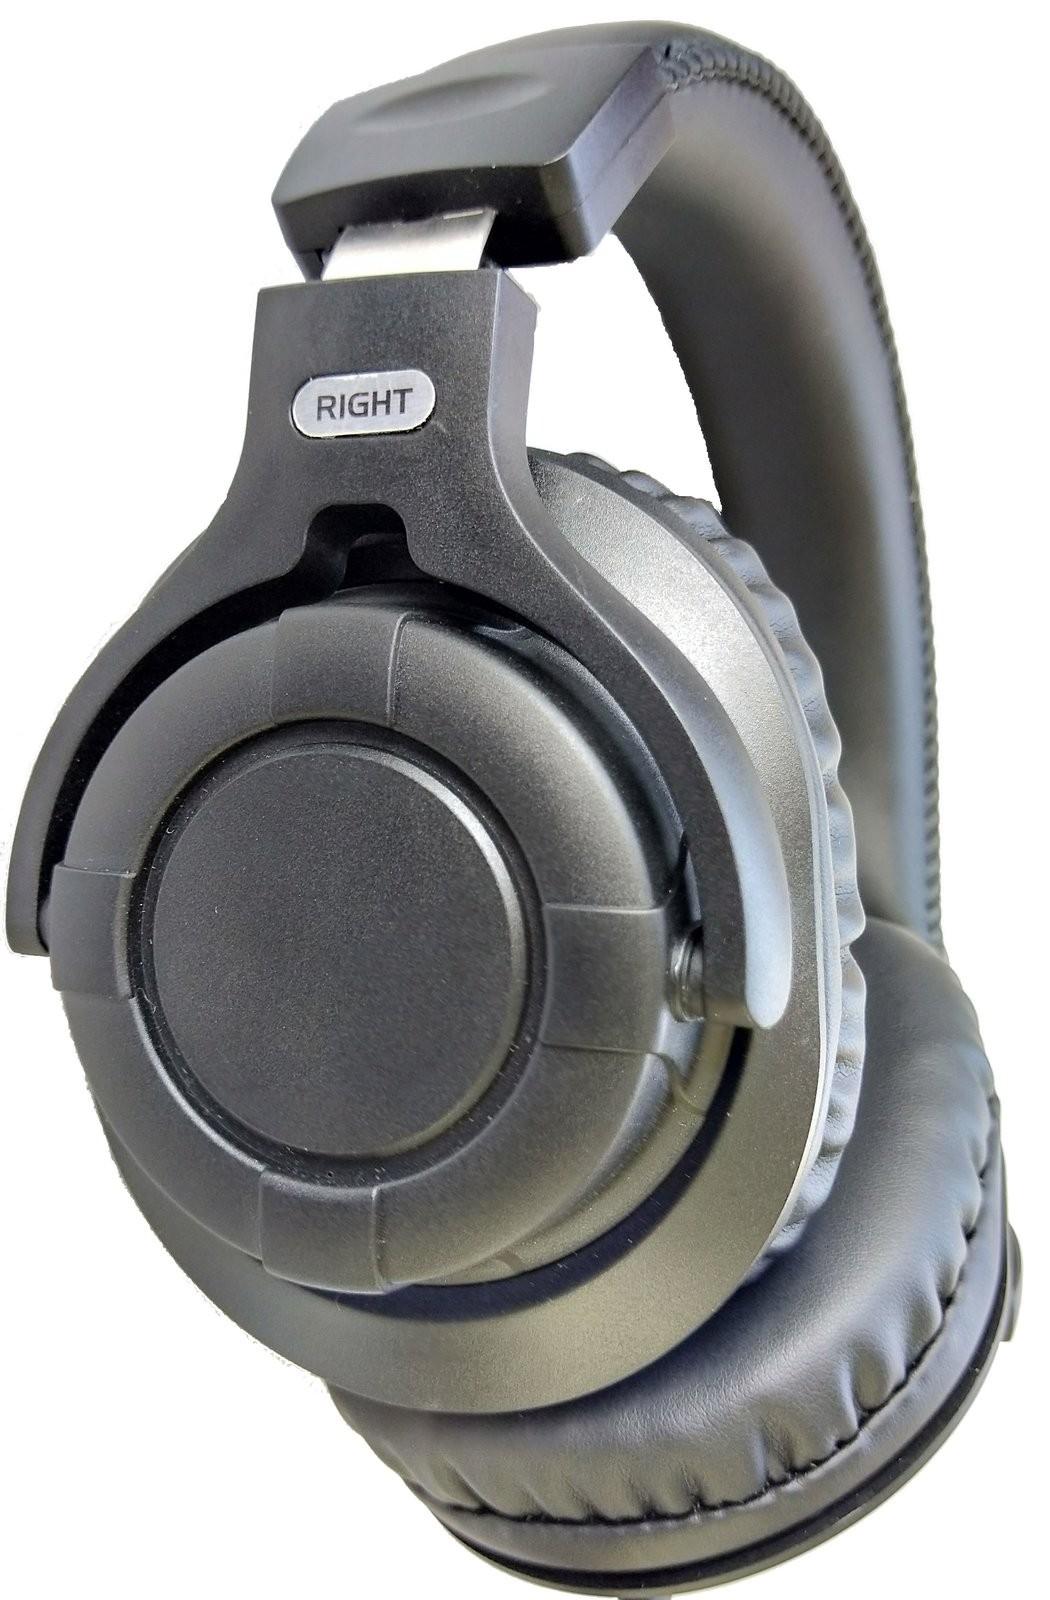 LEWITZ HP710 Fejhallgató - HangszerBarlang 1b460e609a